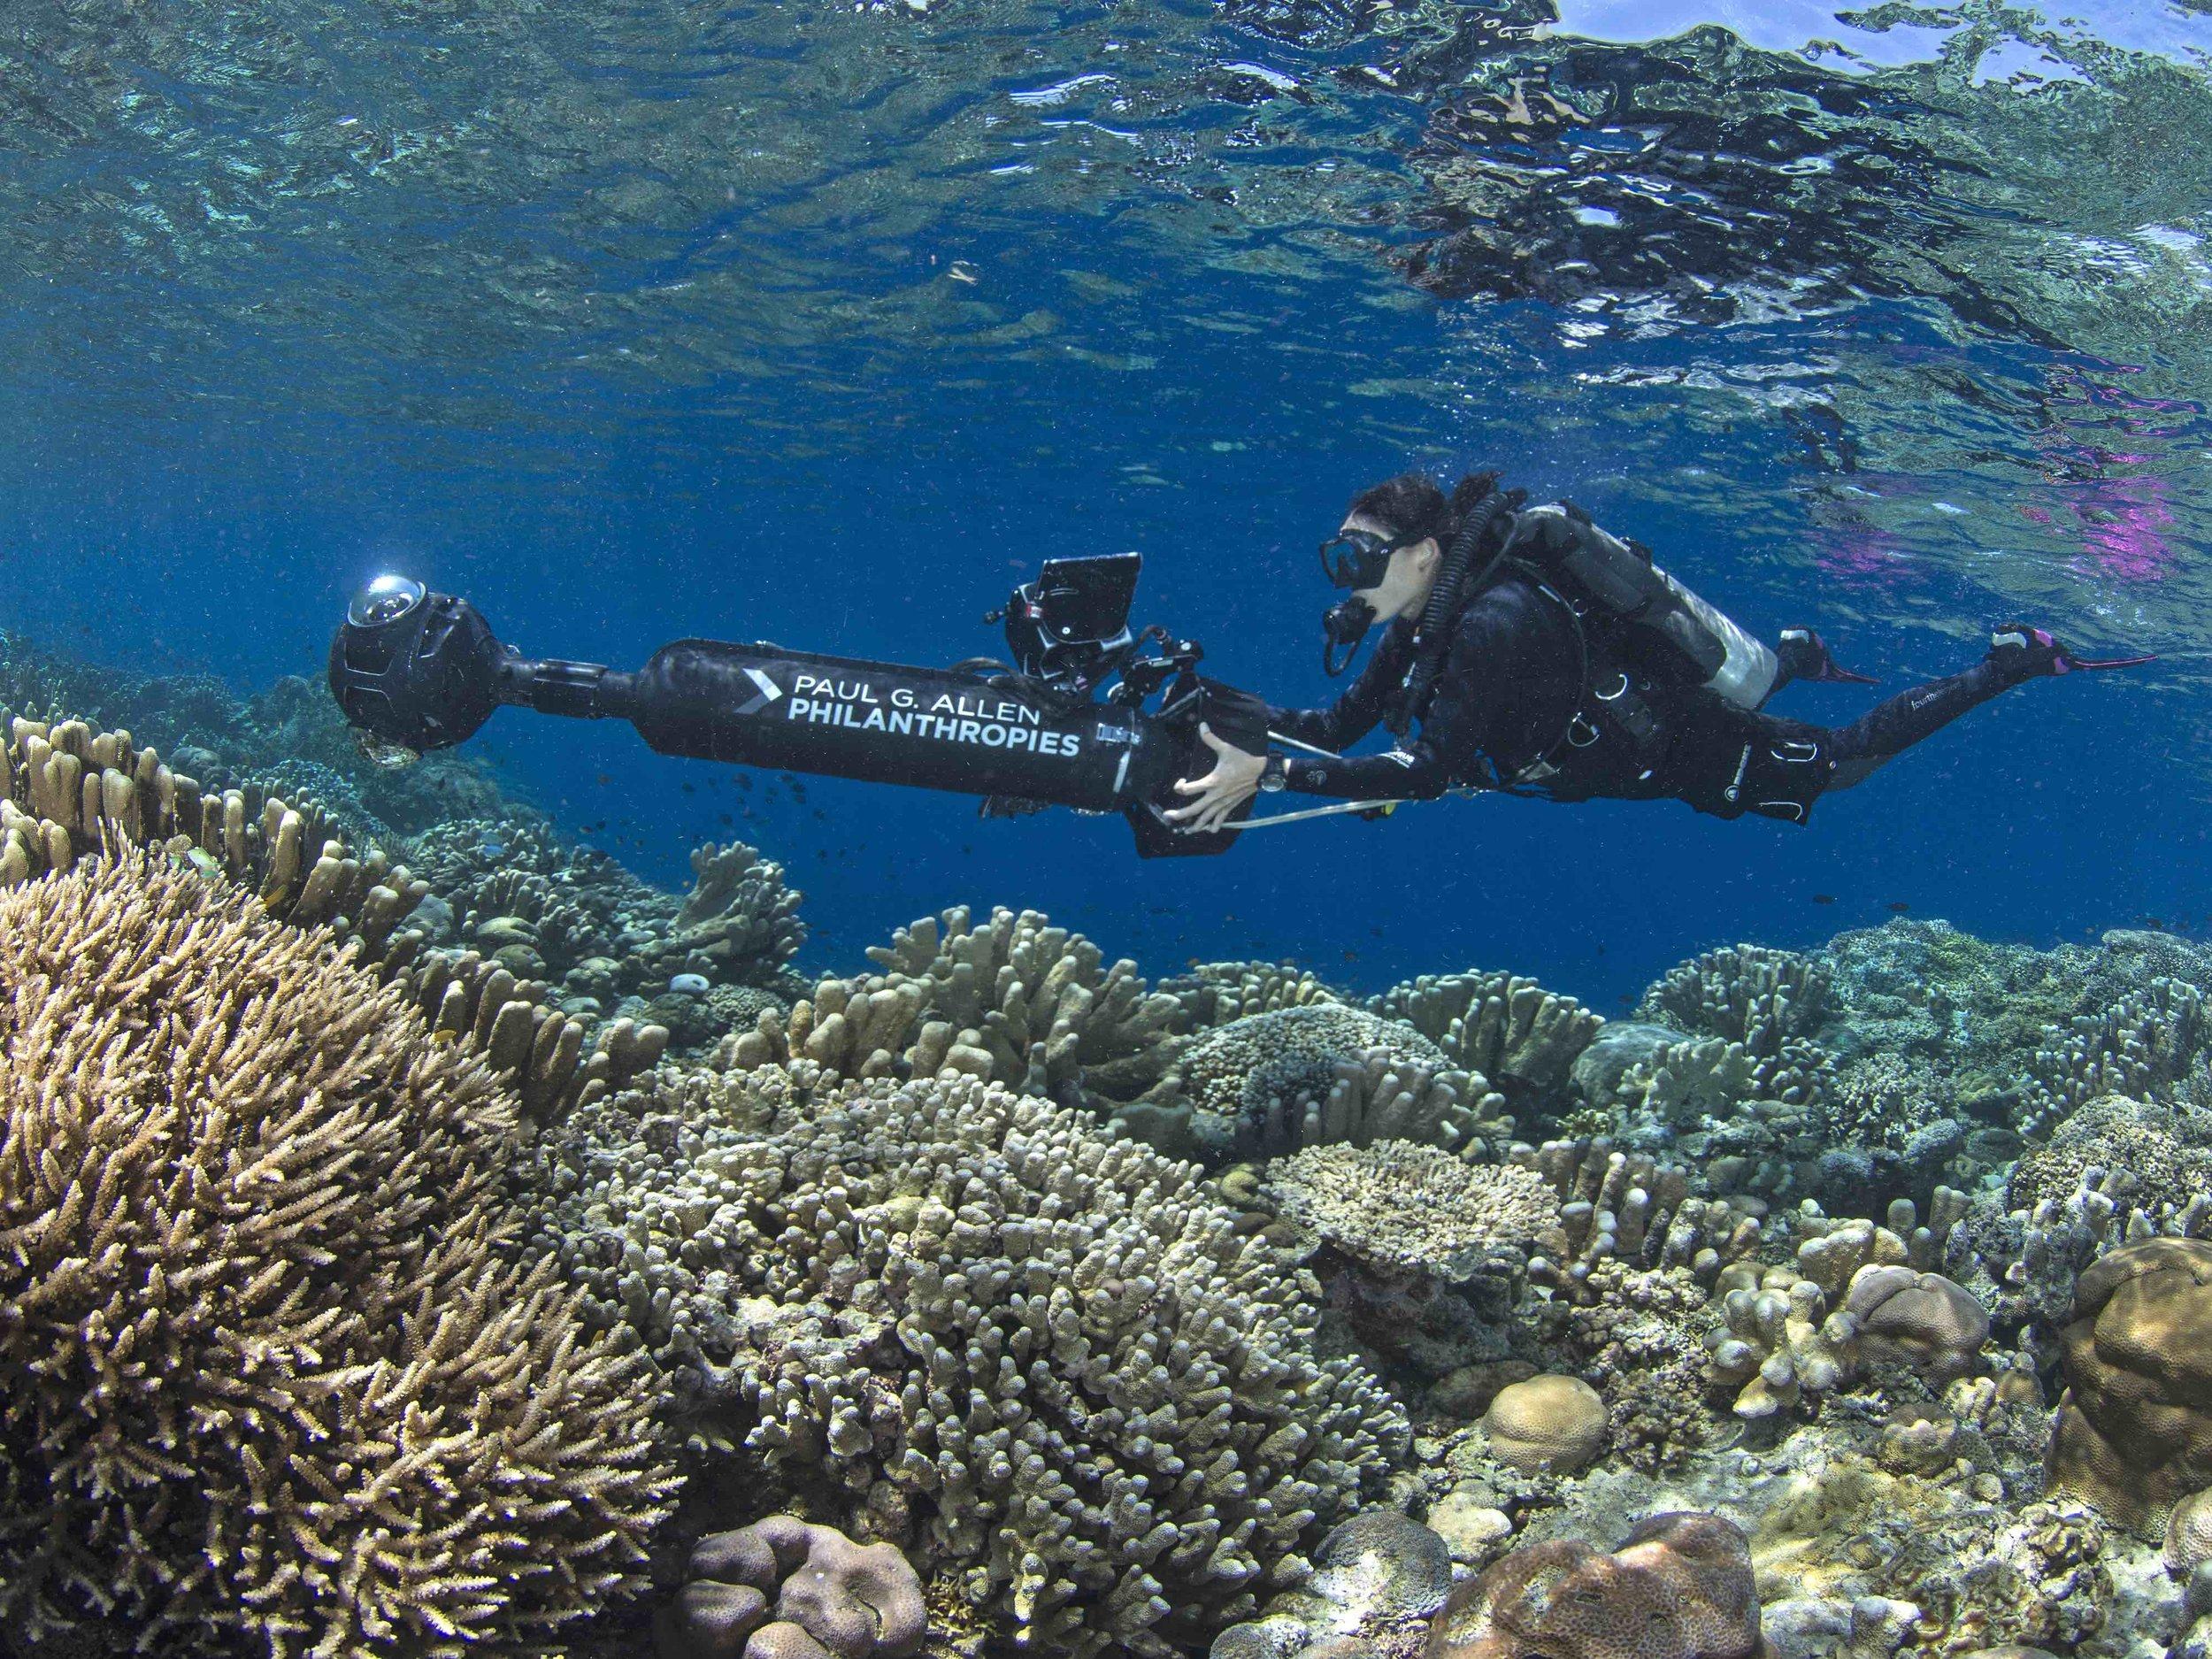 05 - A scientist SURVEYS A CORAL REEF CREDIT: The Ocean Agency / paul g. allen philanthropies